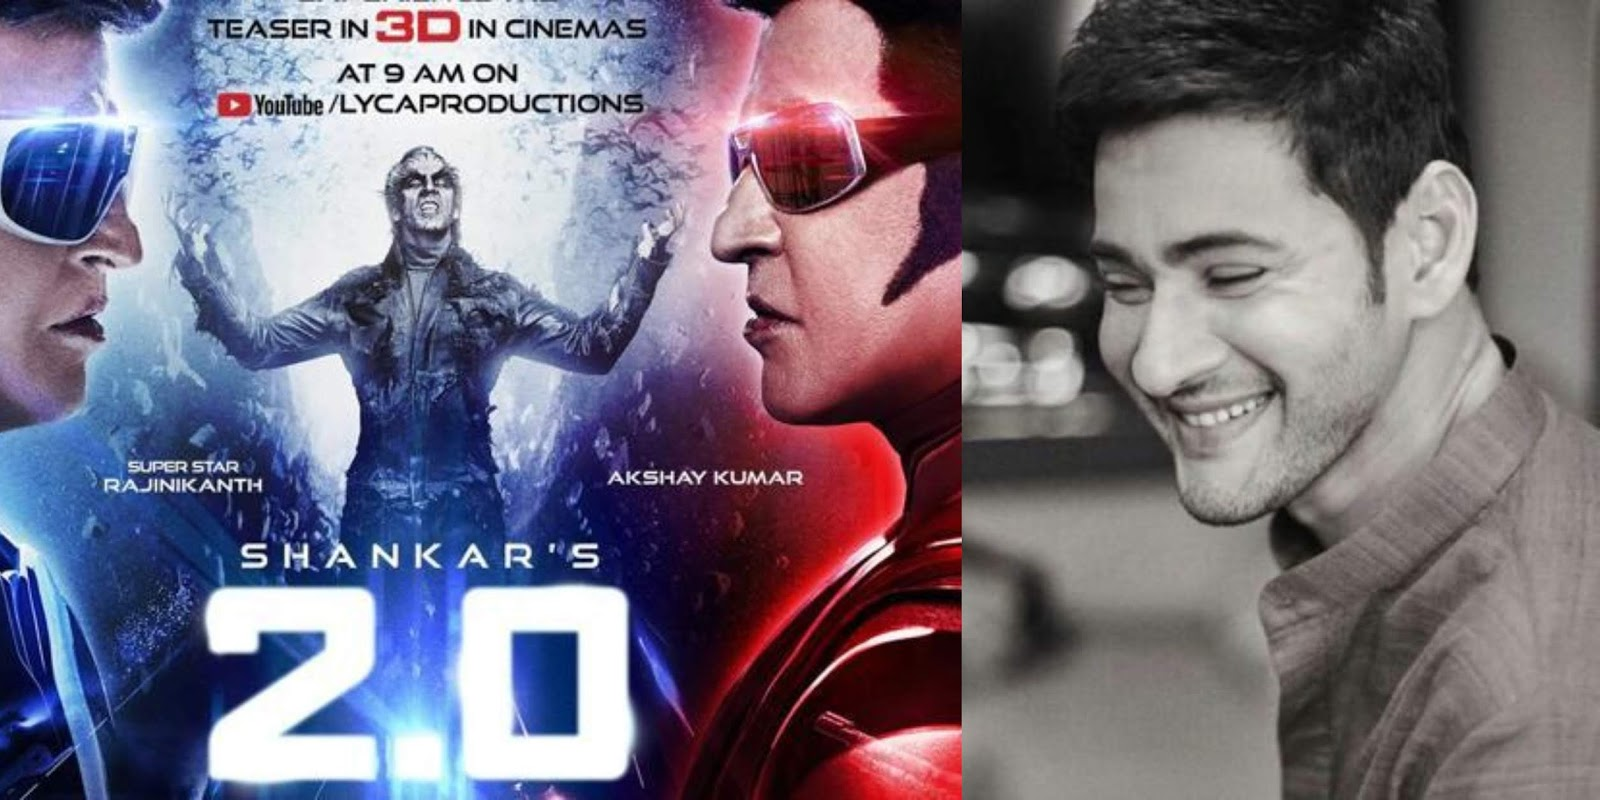 Mahesh Babu Praises Rajiniknath's #2PointO Movie With A Tweet!